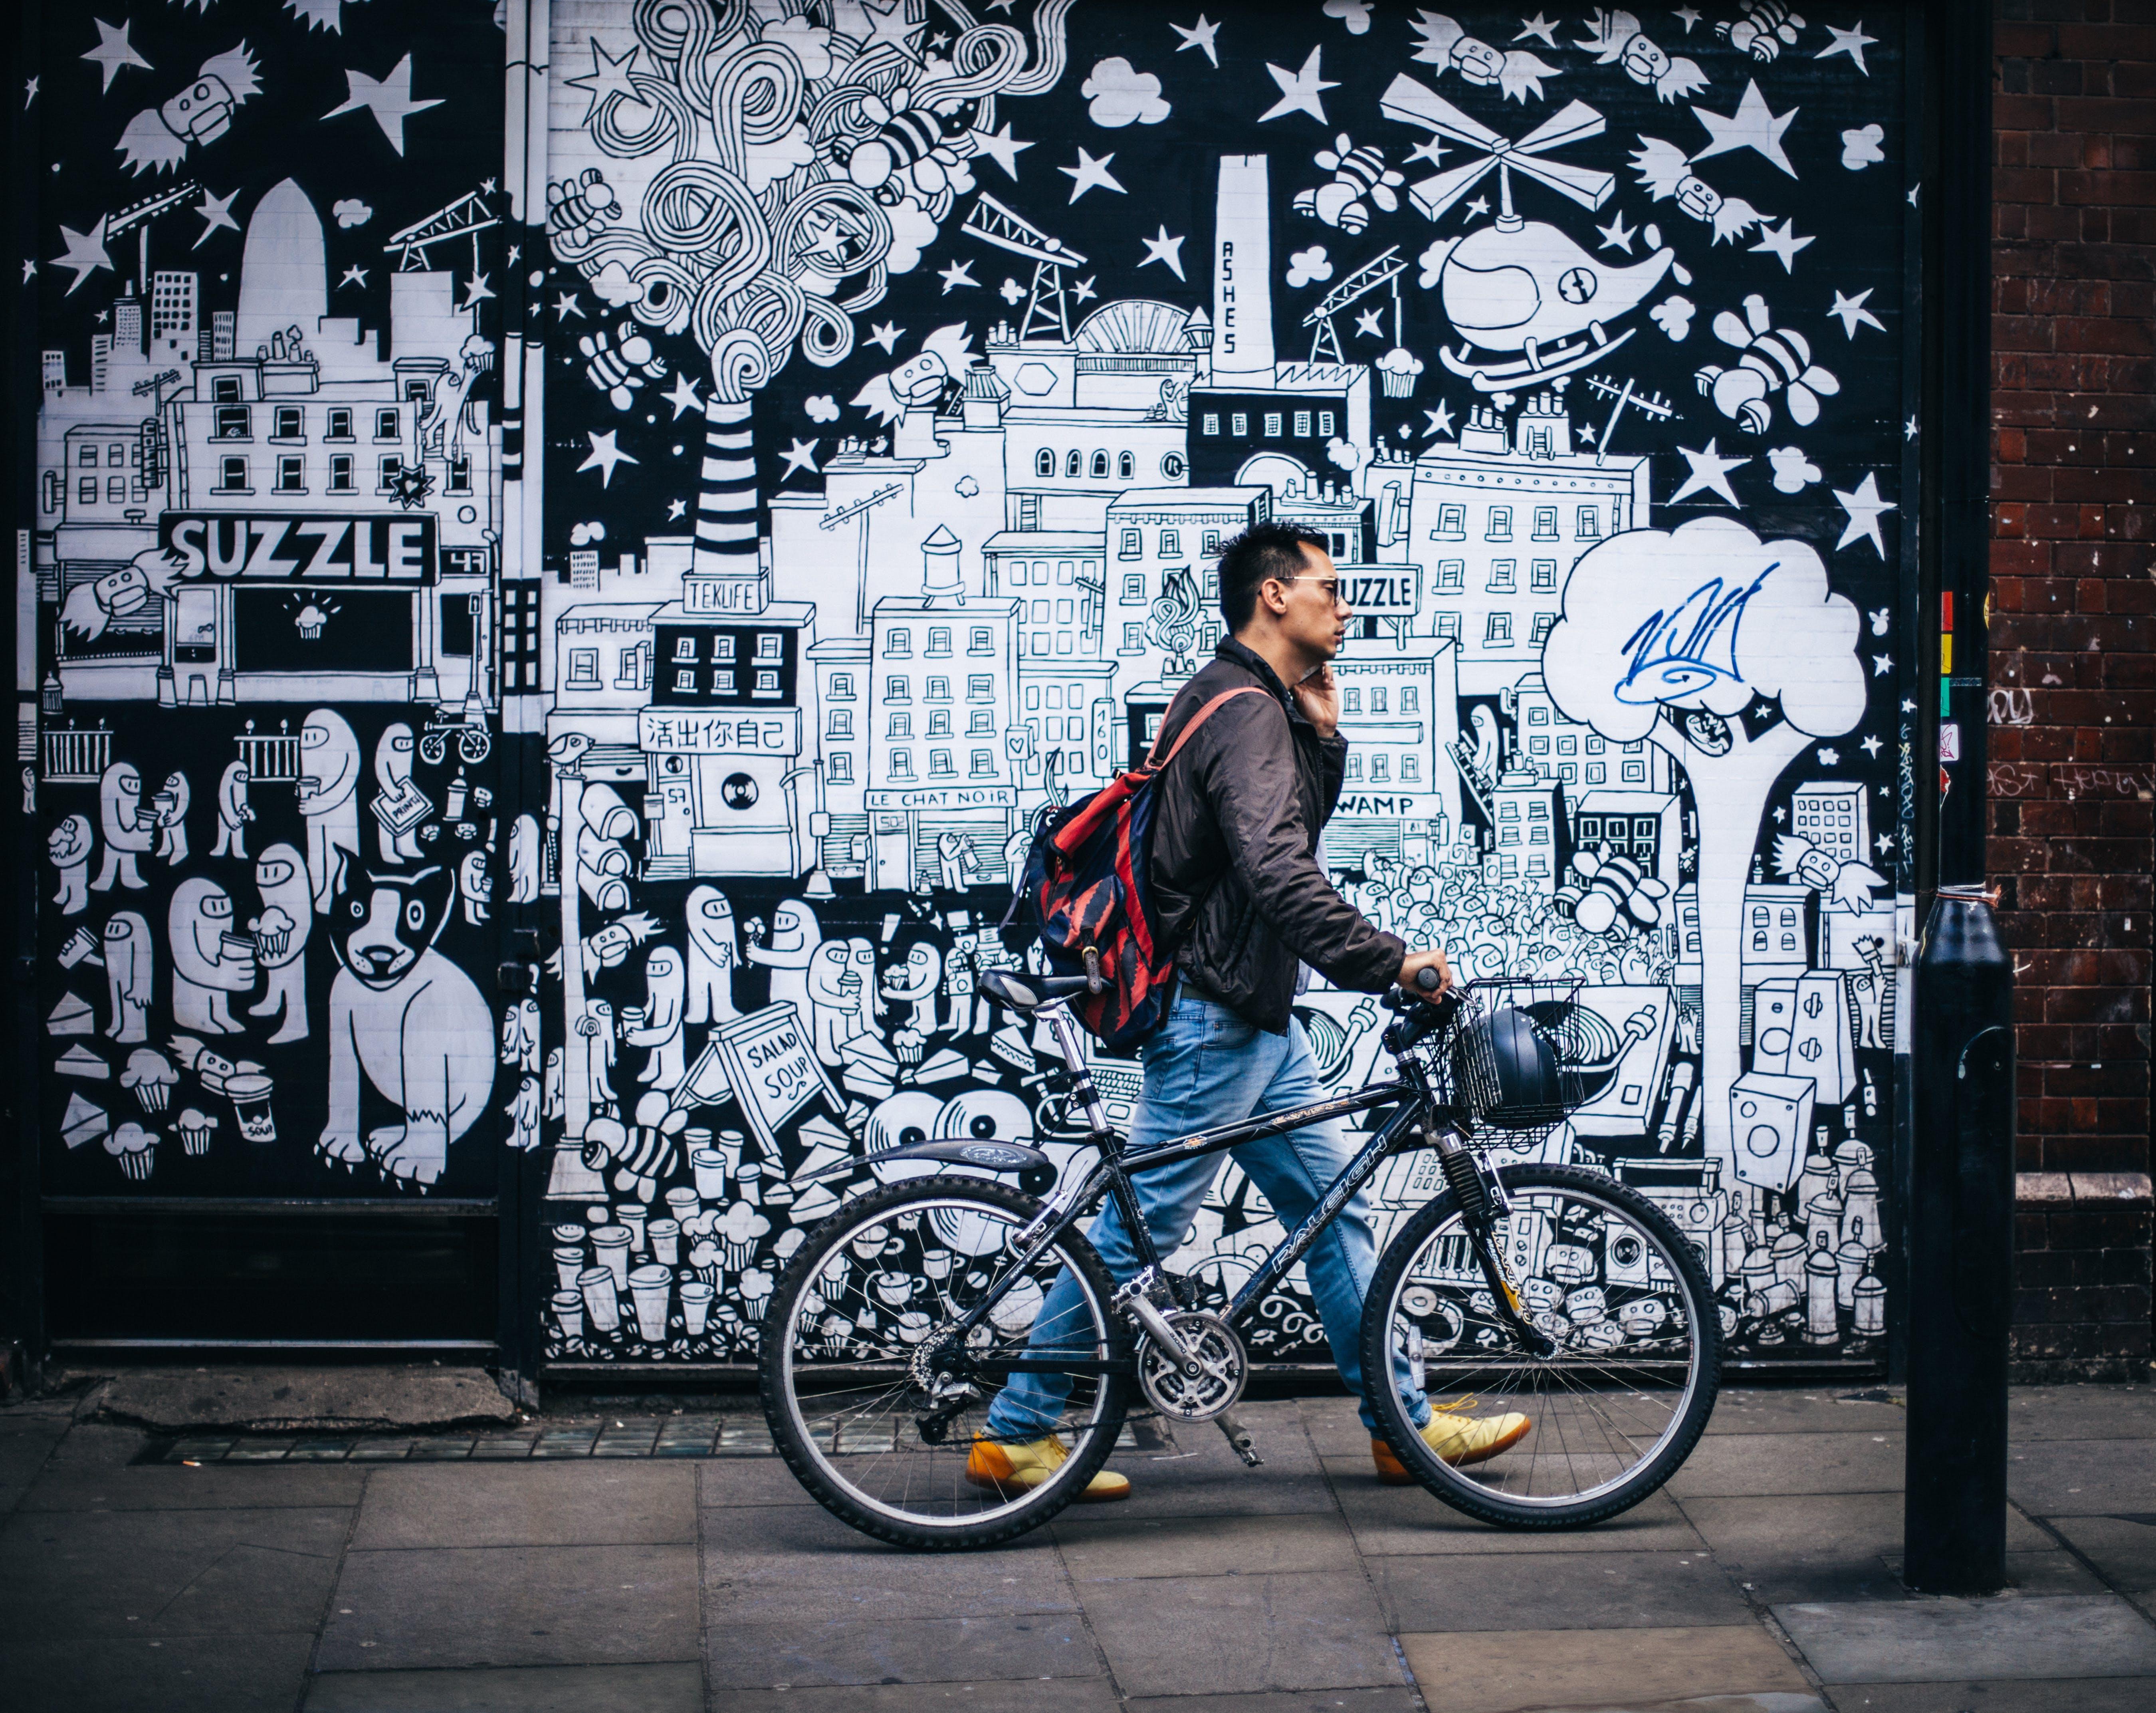 Man in Black Jacket Holding a Black Hardtail Bike Near Black and White Art Wall